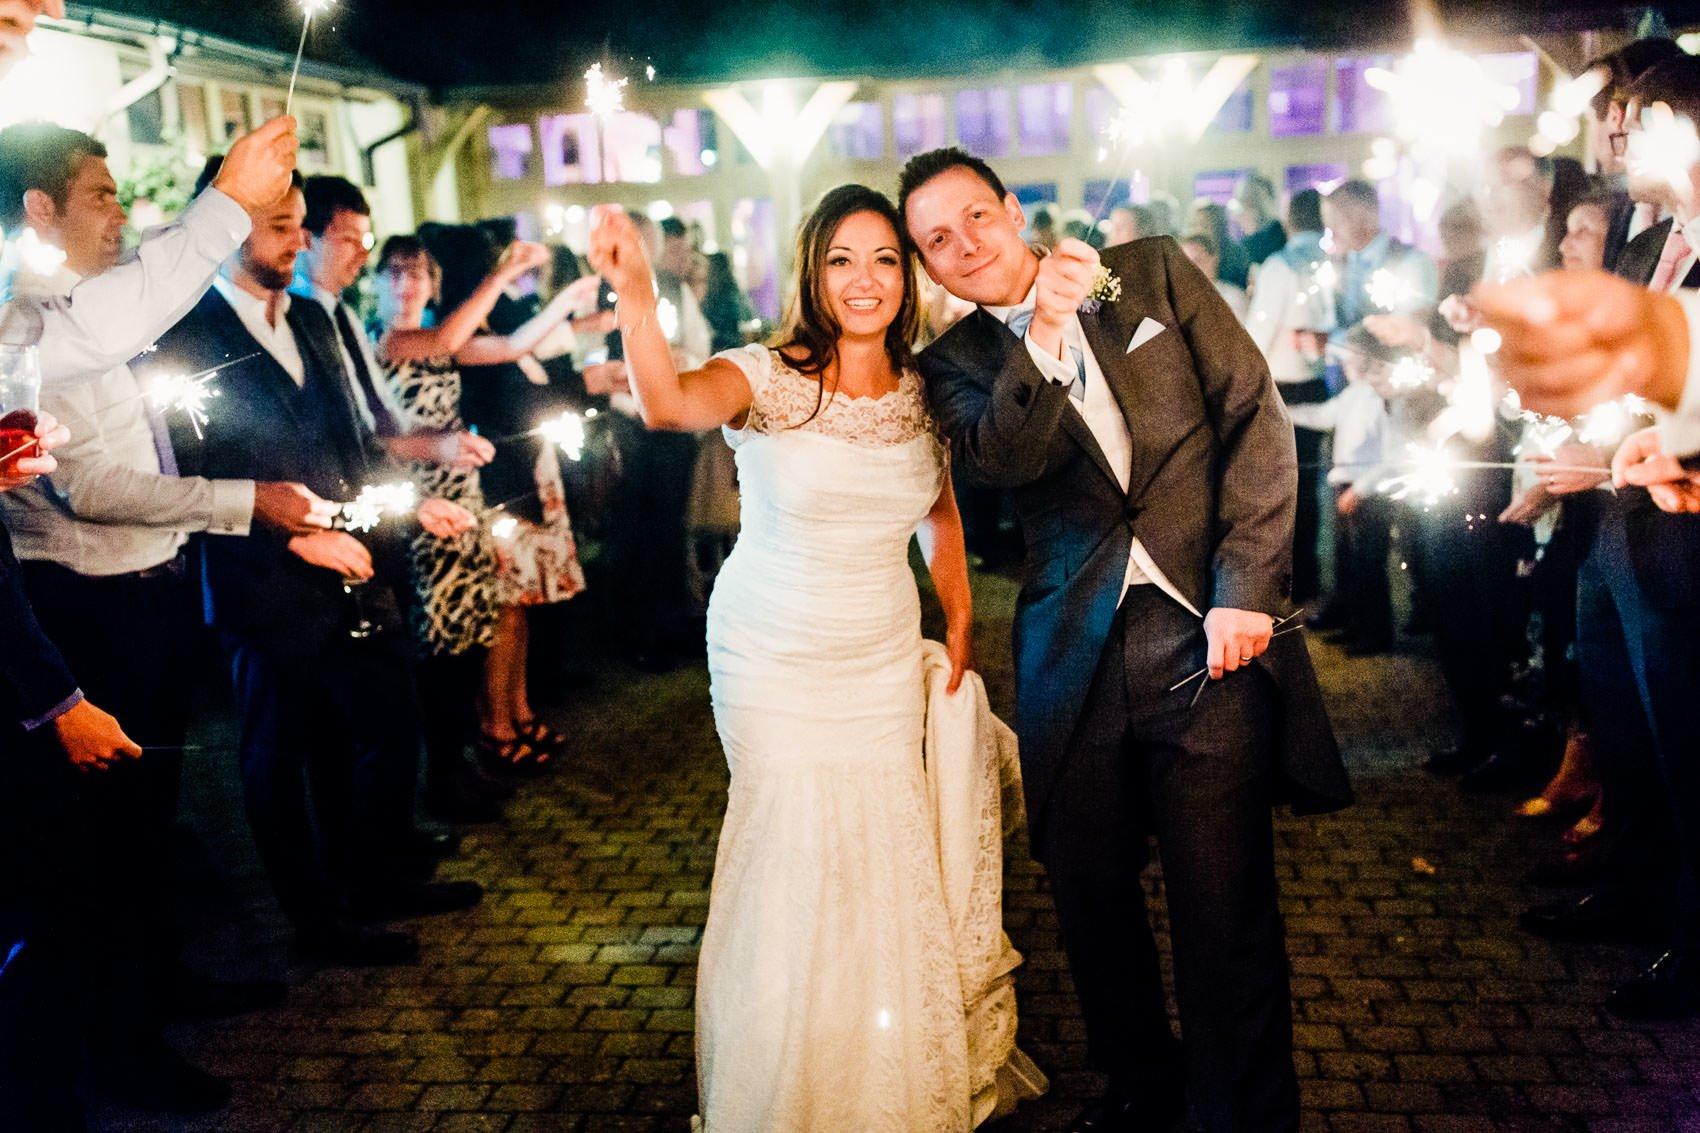 Rivervale Barn Wedding Photographer - Oli and Leyla 51